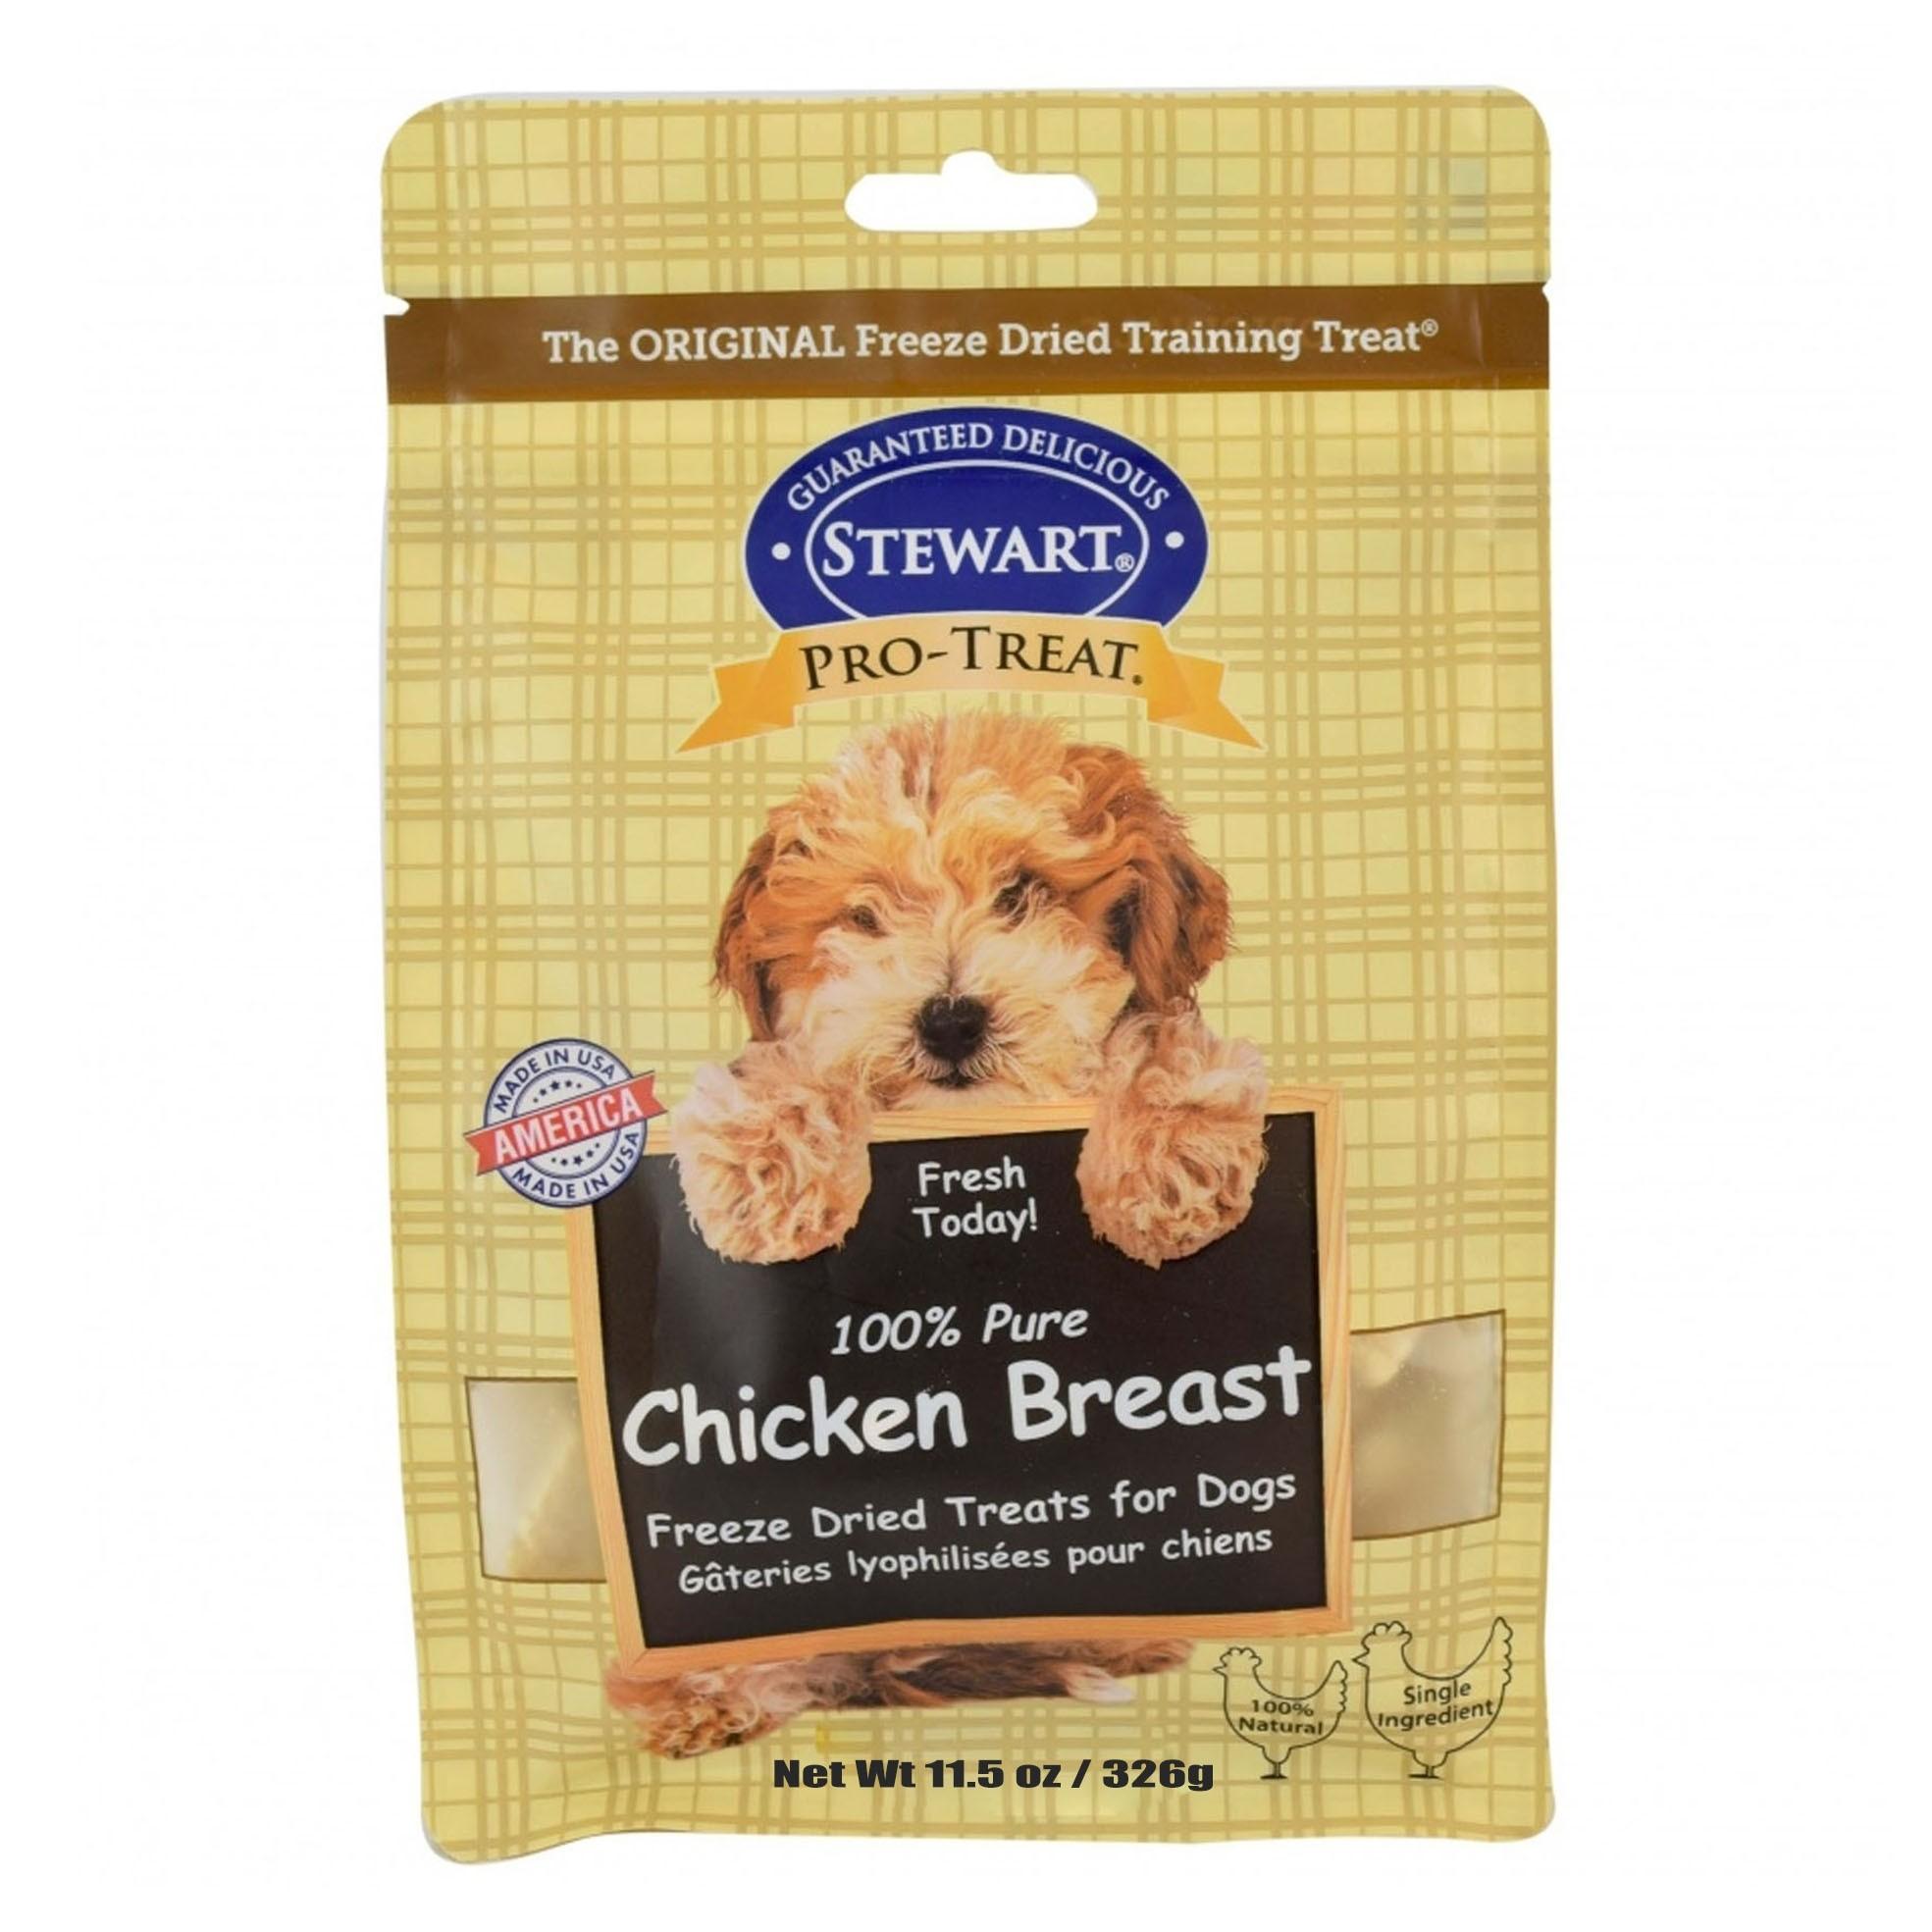 STEWART® PRO-TREAT FREEZE DRIED CHICKEN BREAST - 11.5 OZ [401709]